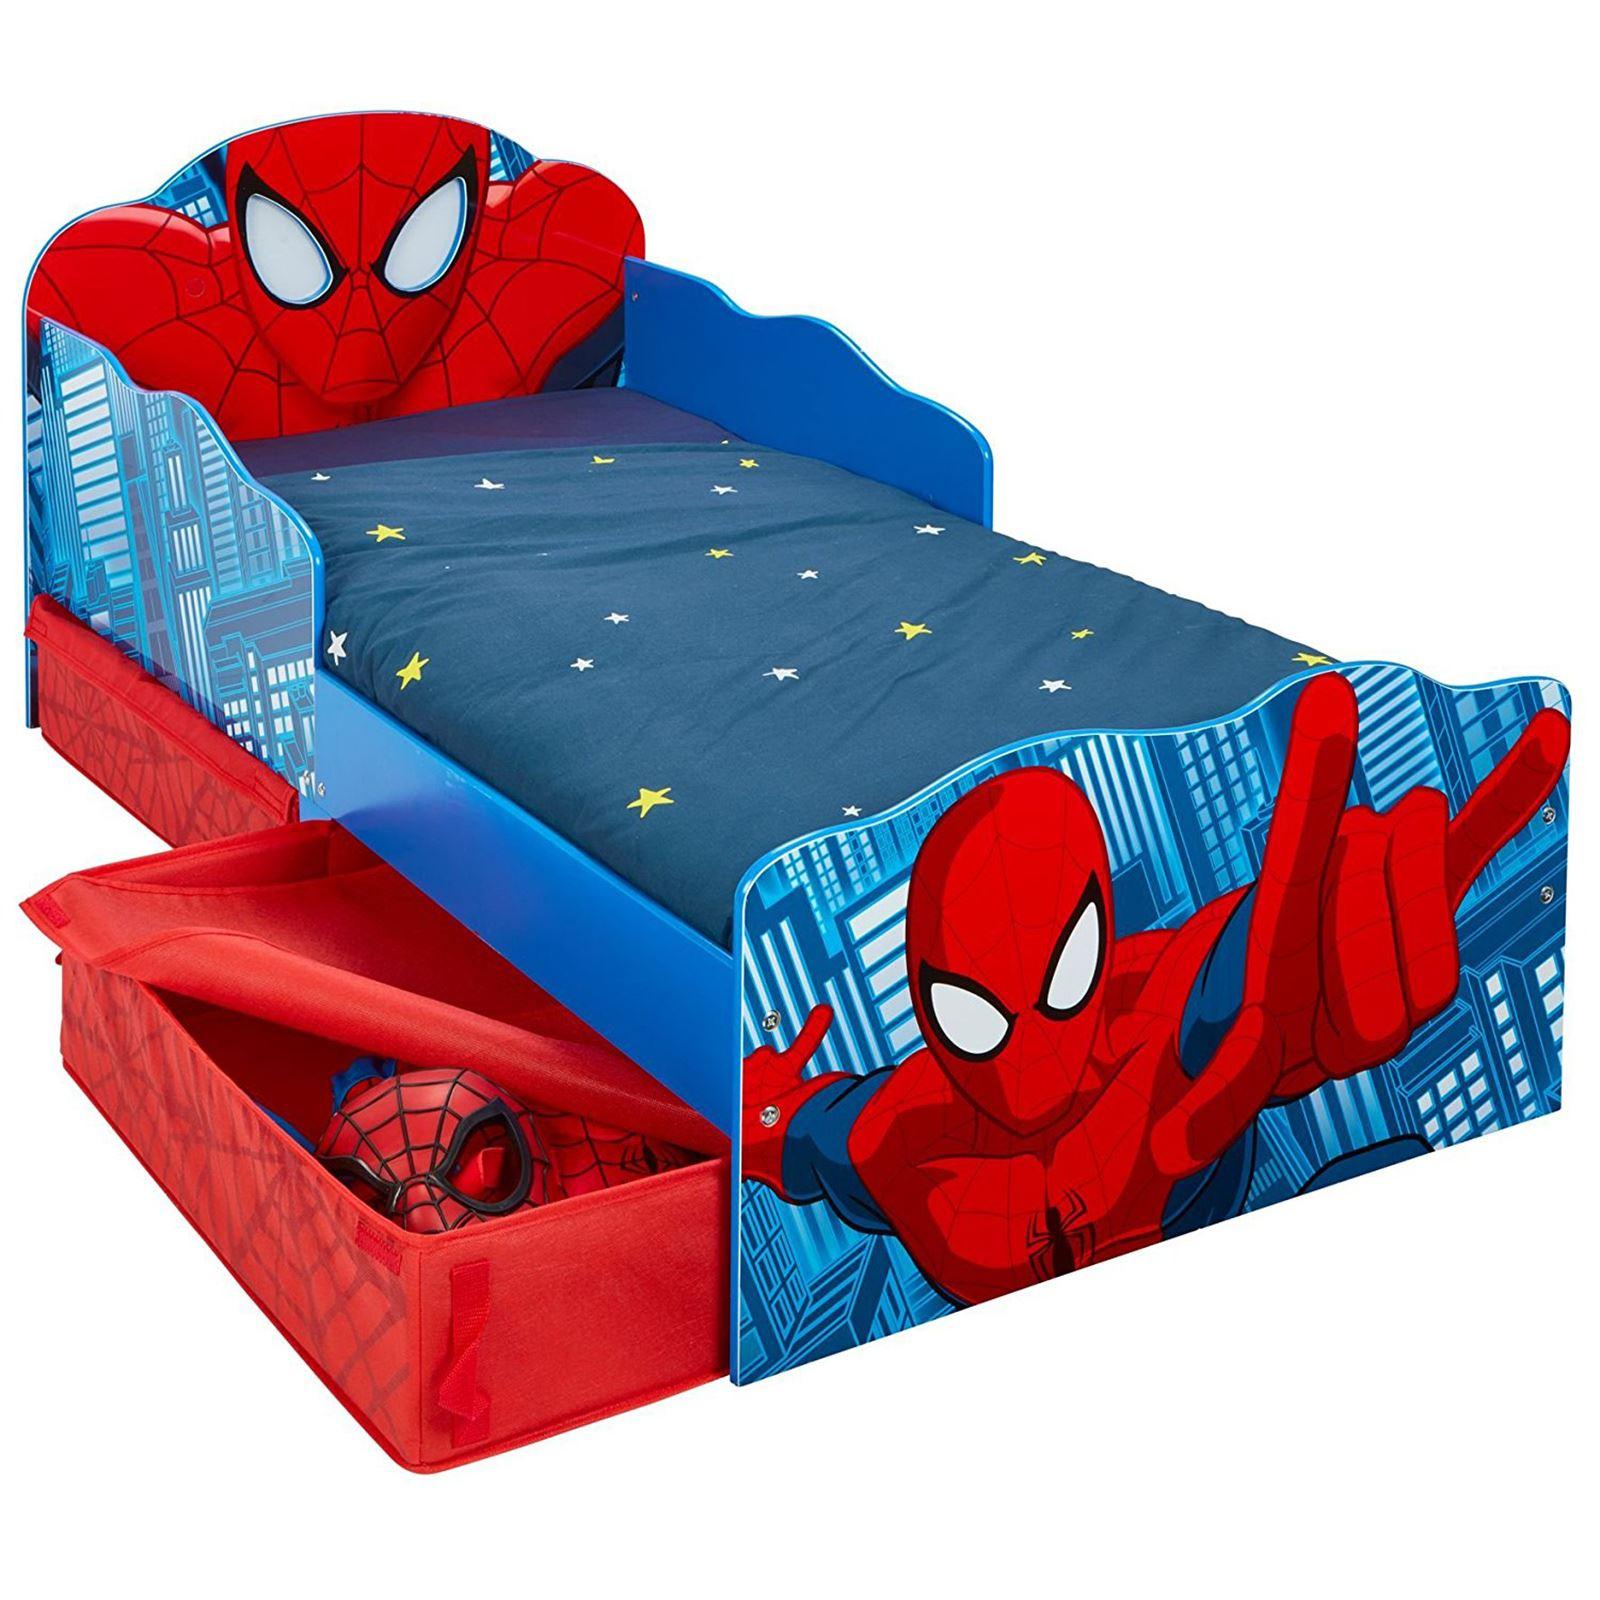 SPIDERMAN JUNIOR TODDLER BED WITH STORAGE LIGHT UP EYES ...